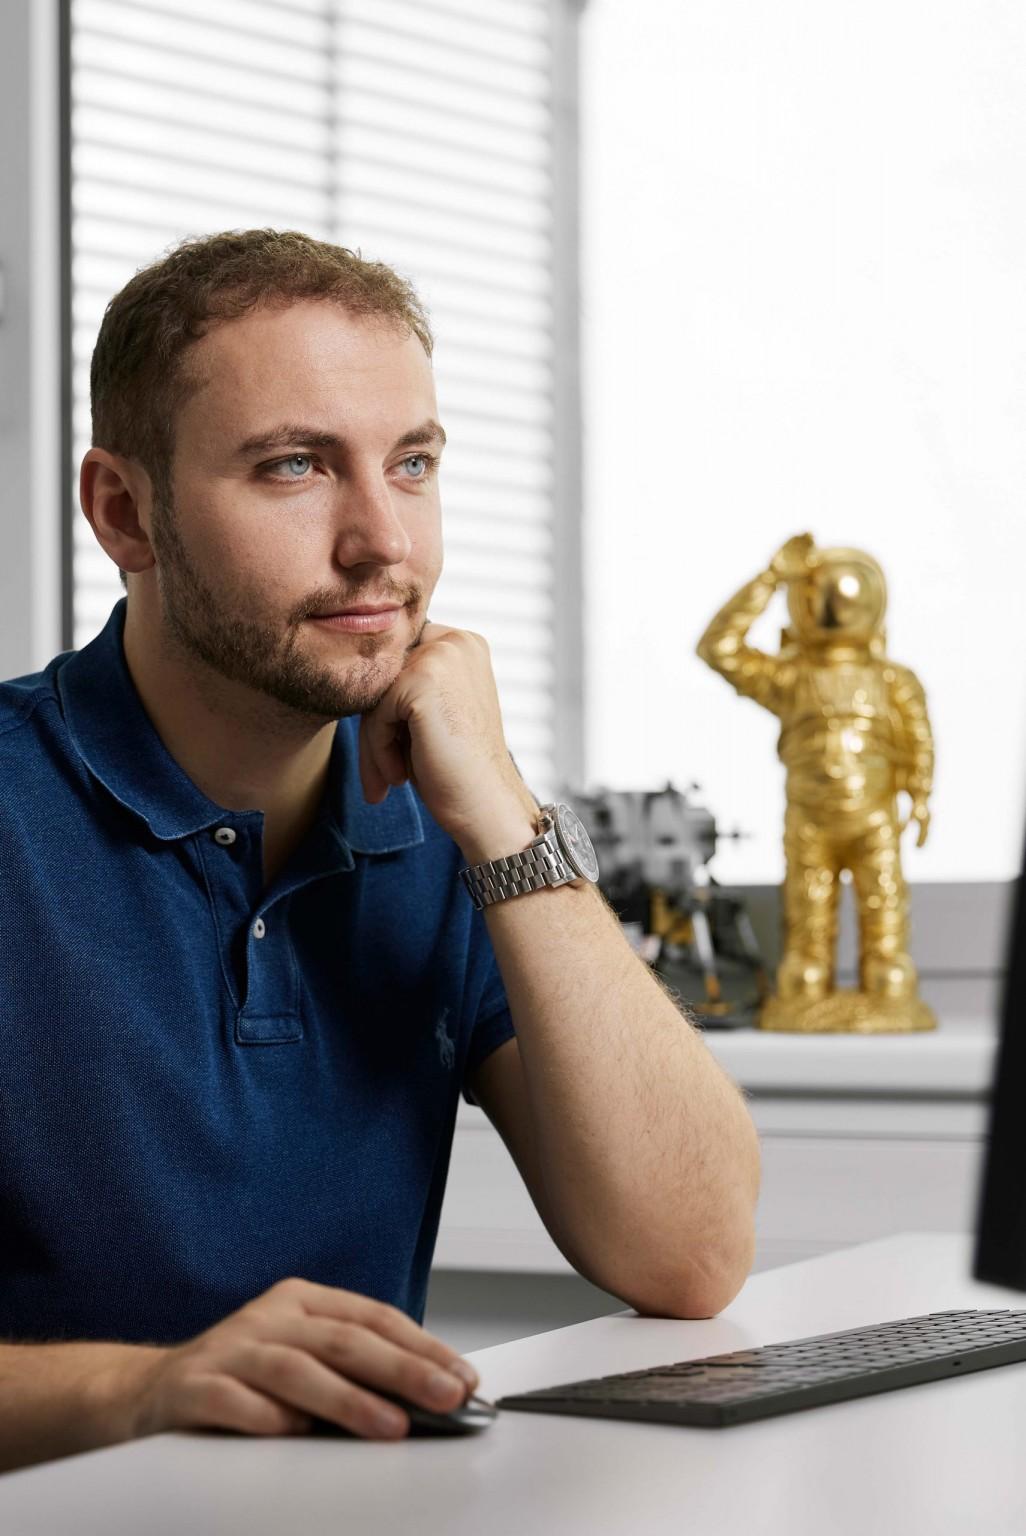 Simon Wohlleb Weltraumagentur Wikipedia